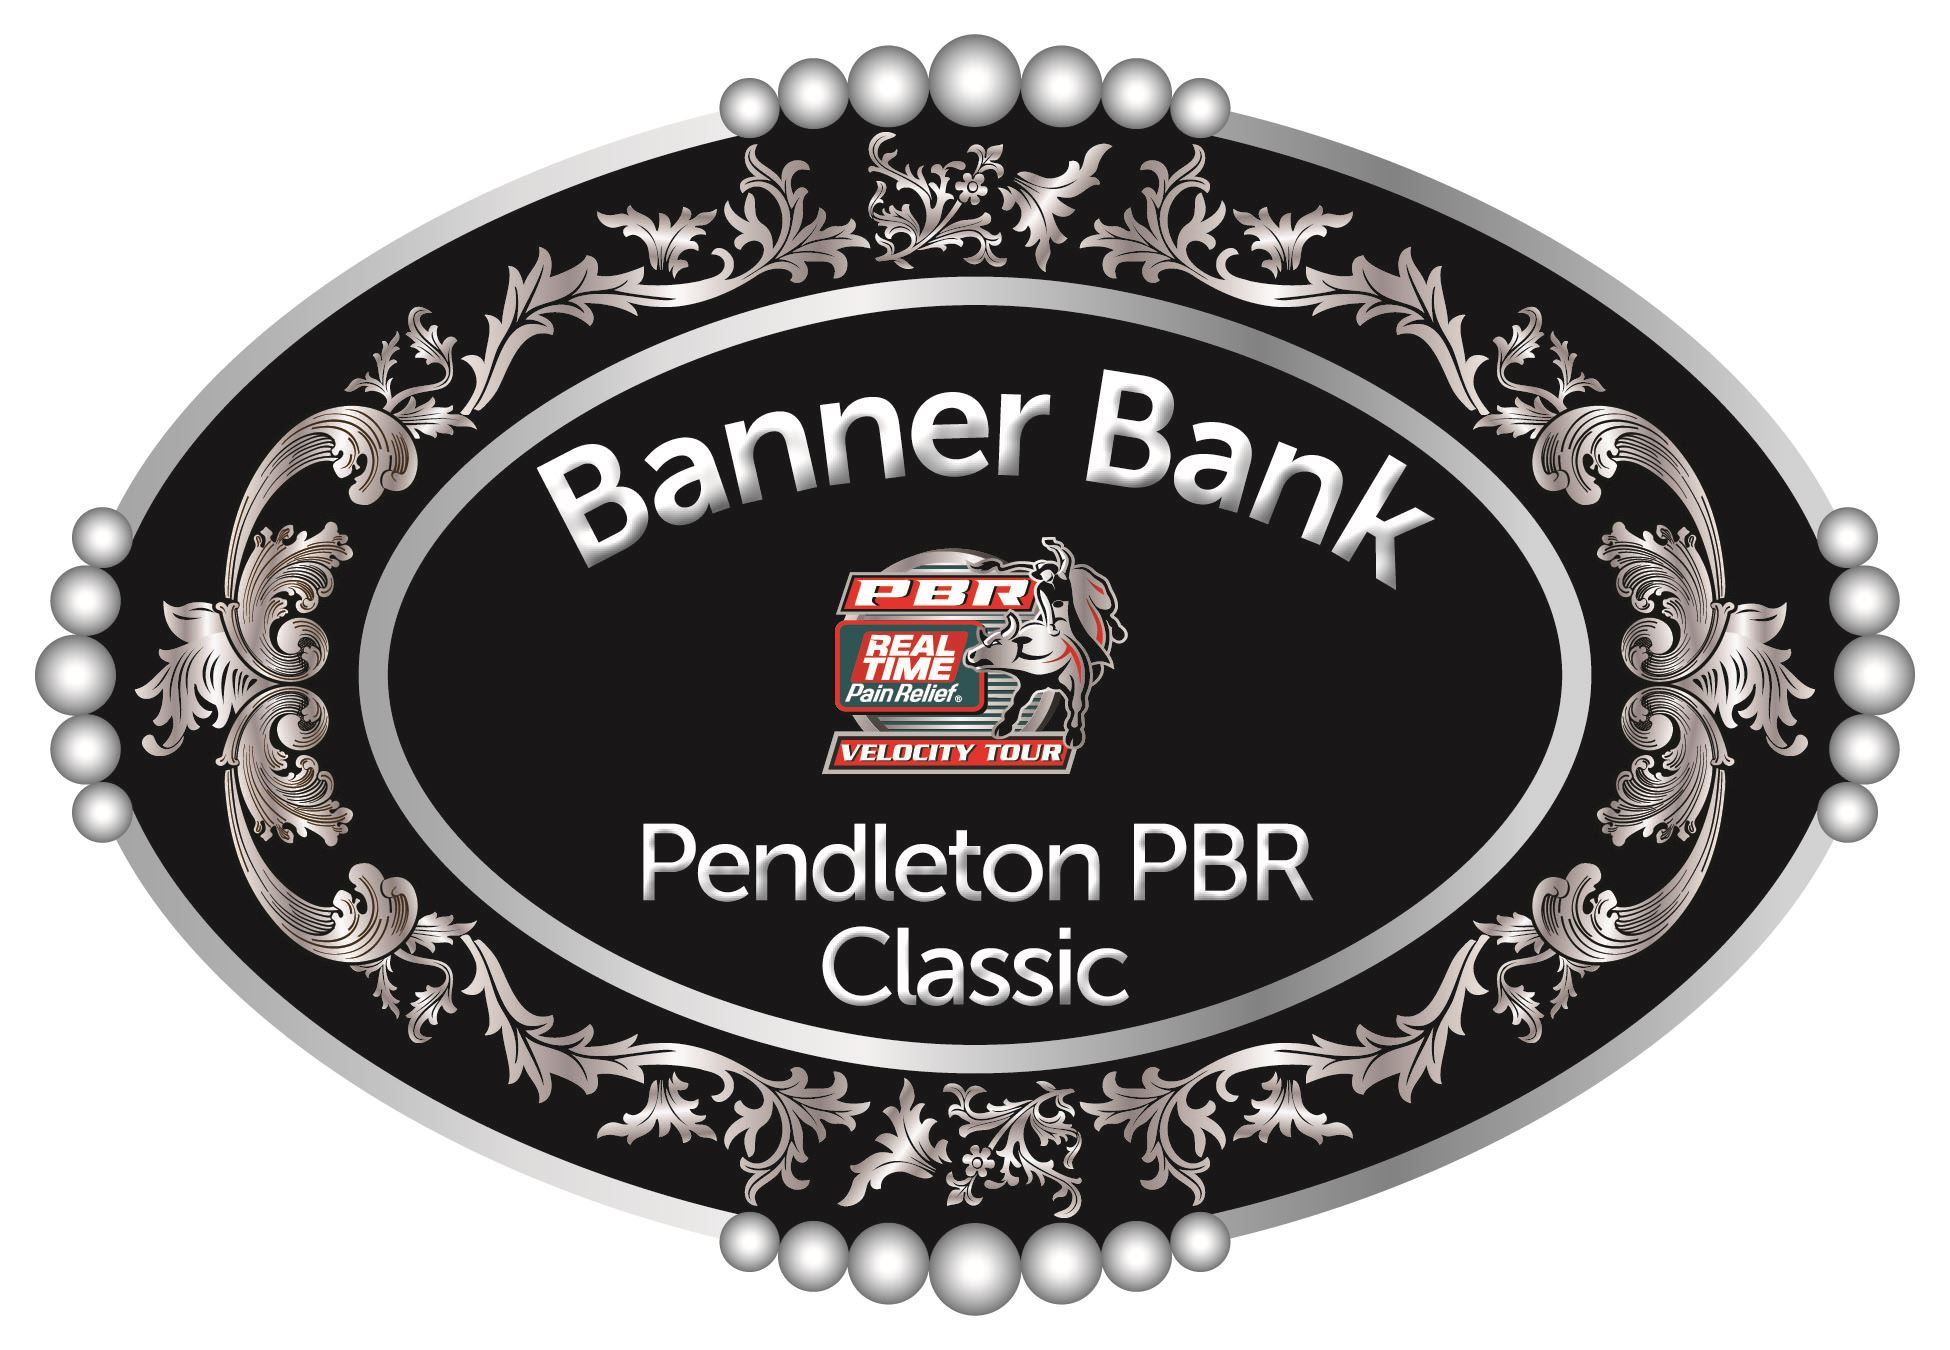 Banner Bank- Pendleton PBR Classic